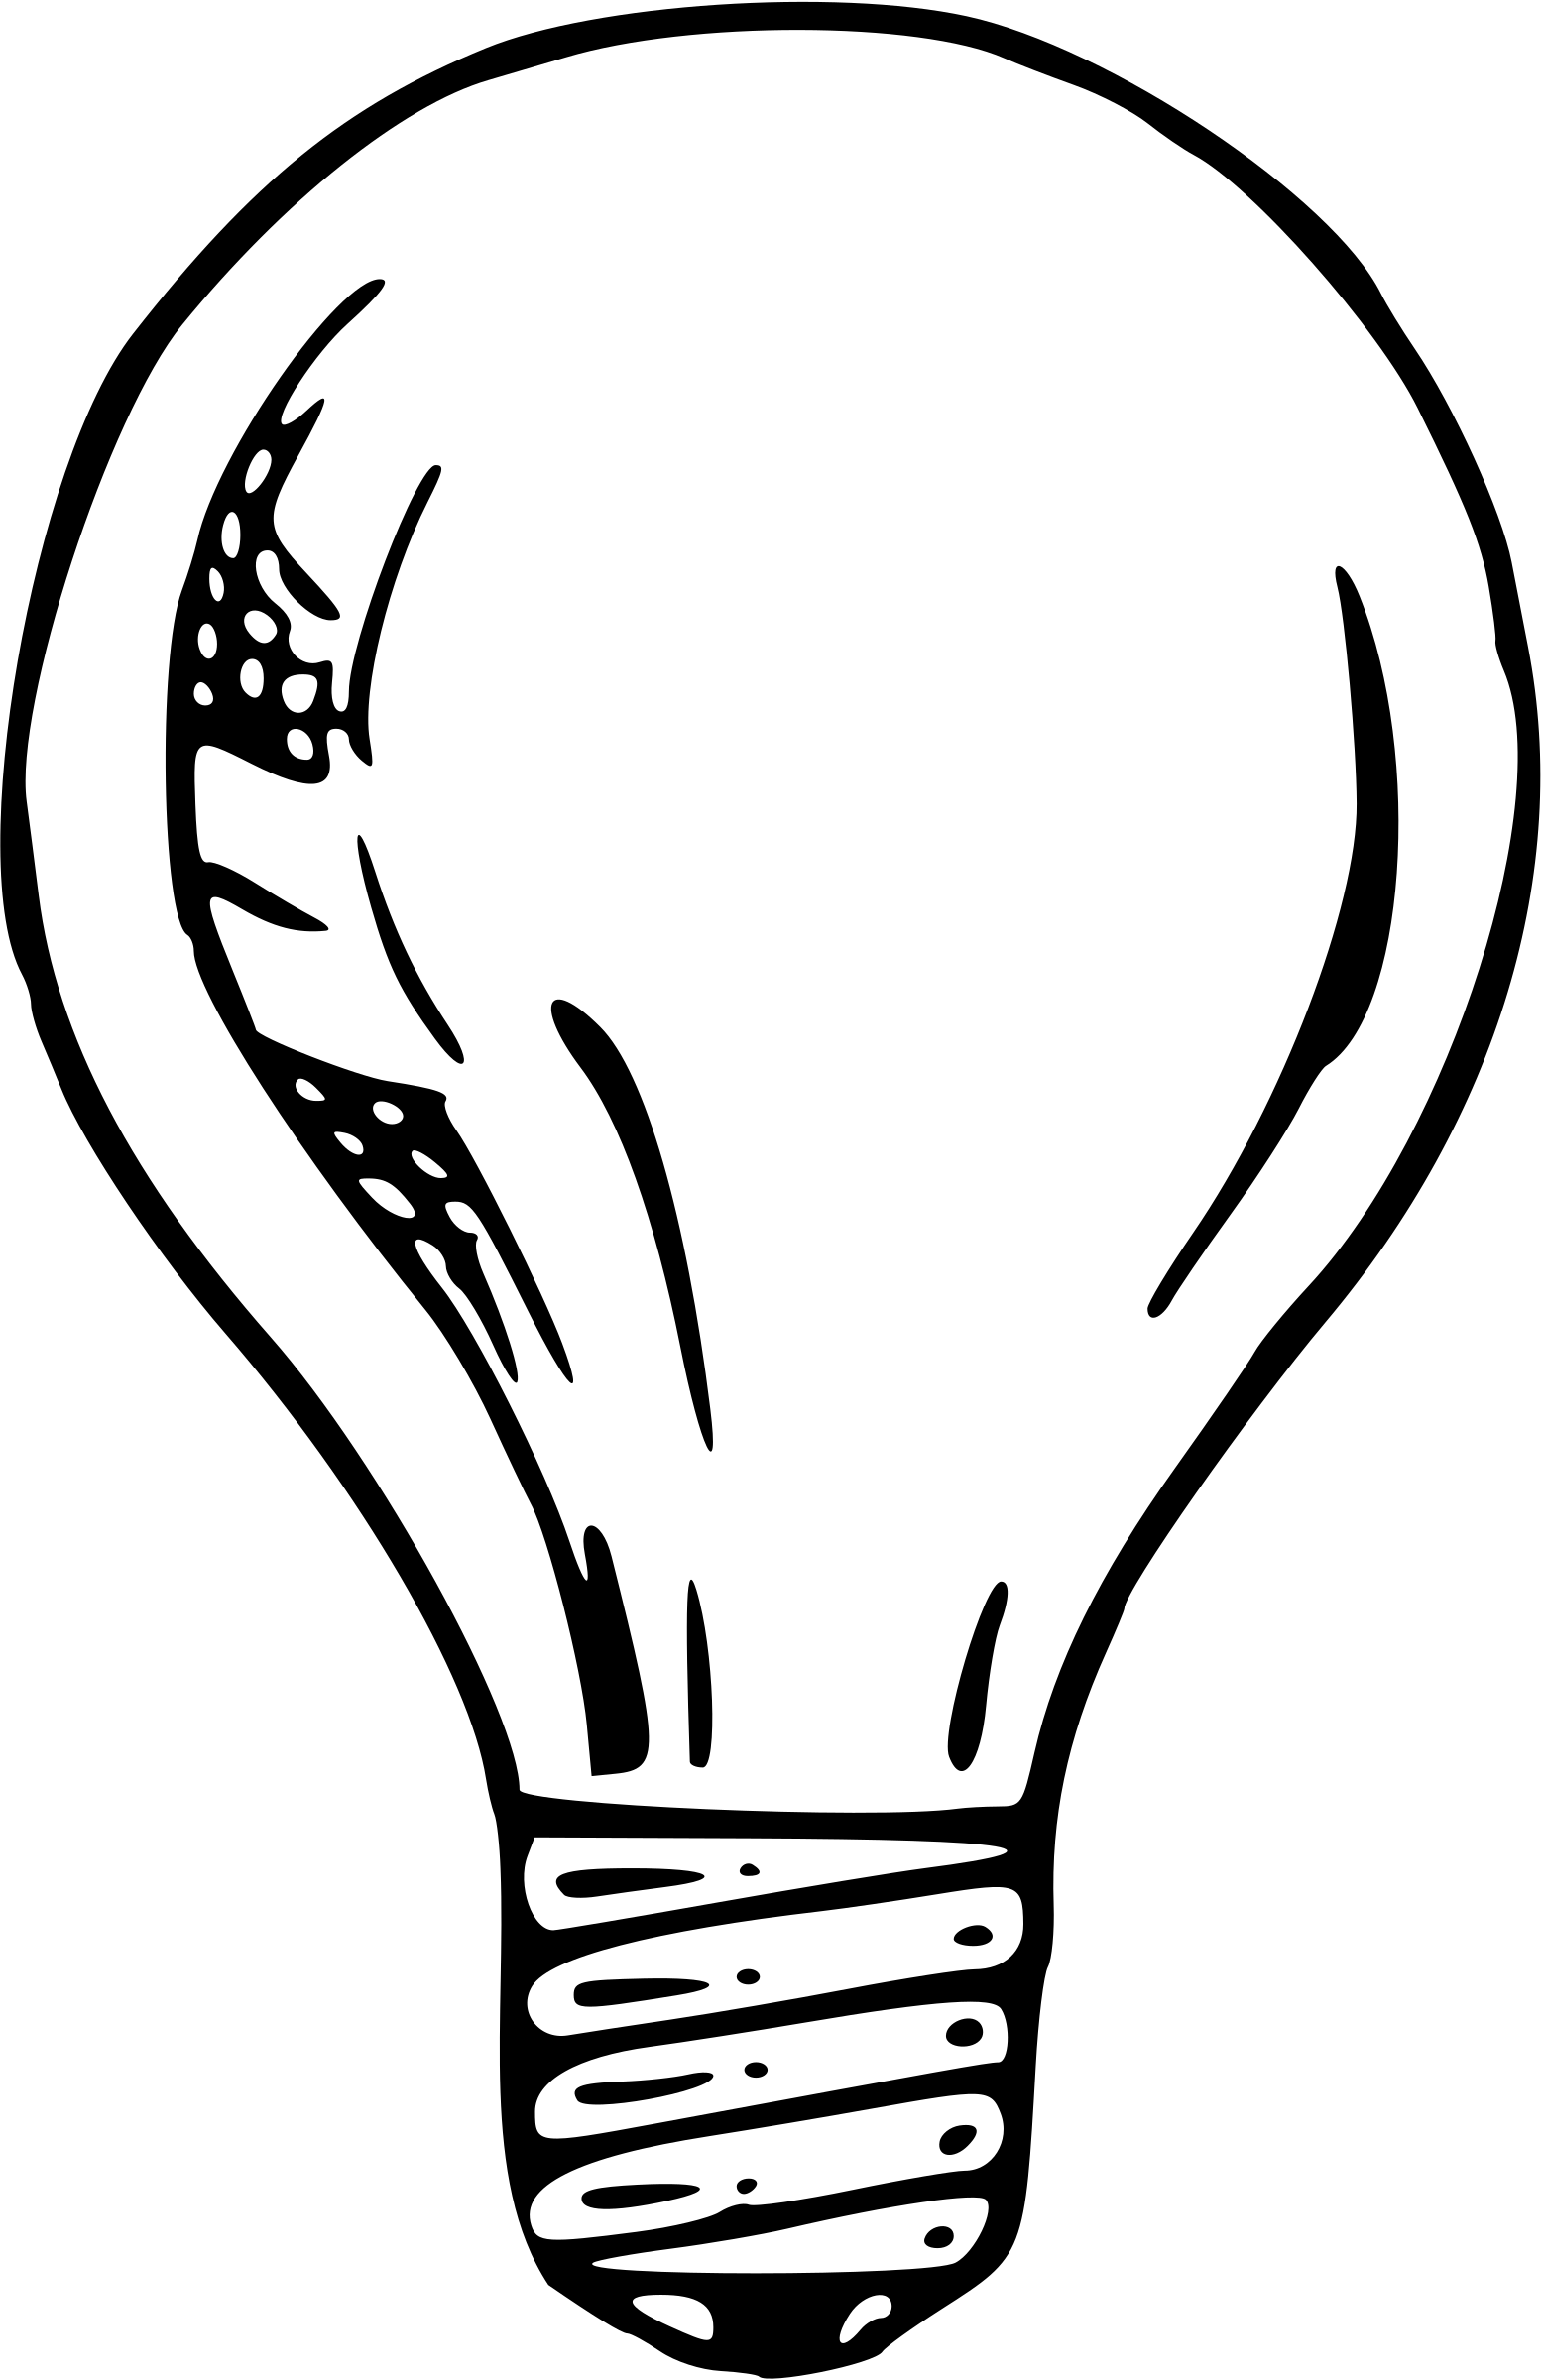 Risultati Immagini Per Light Bulb Drawing